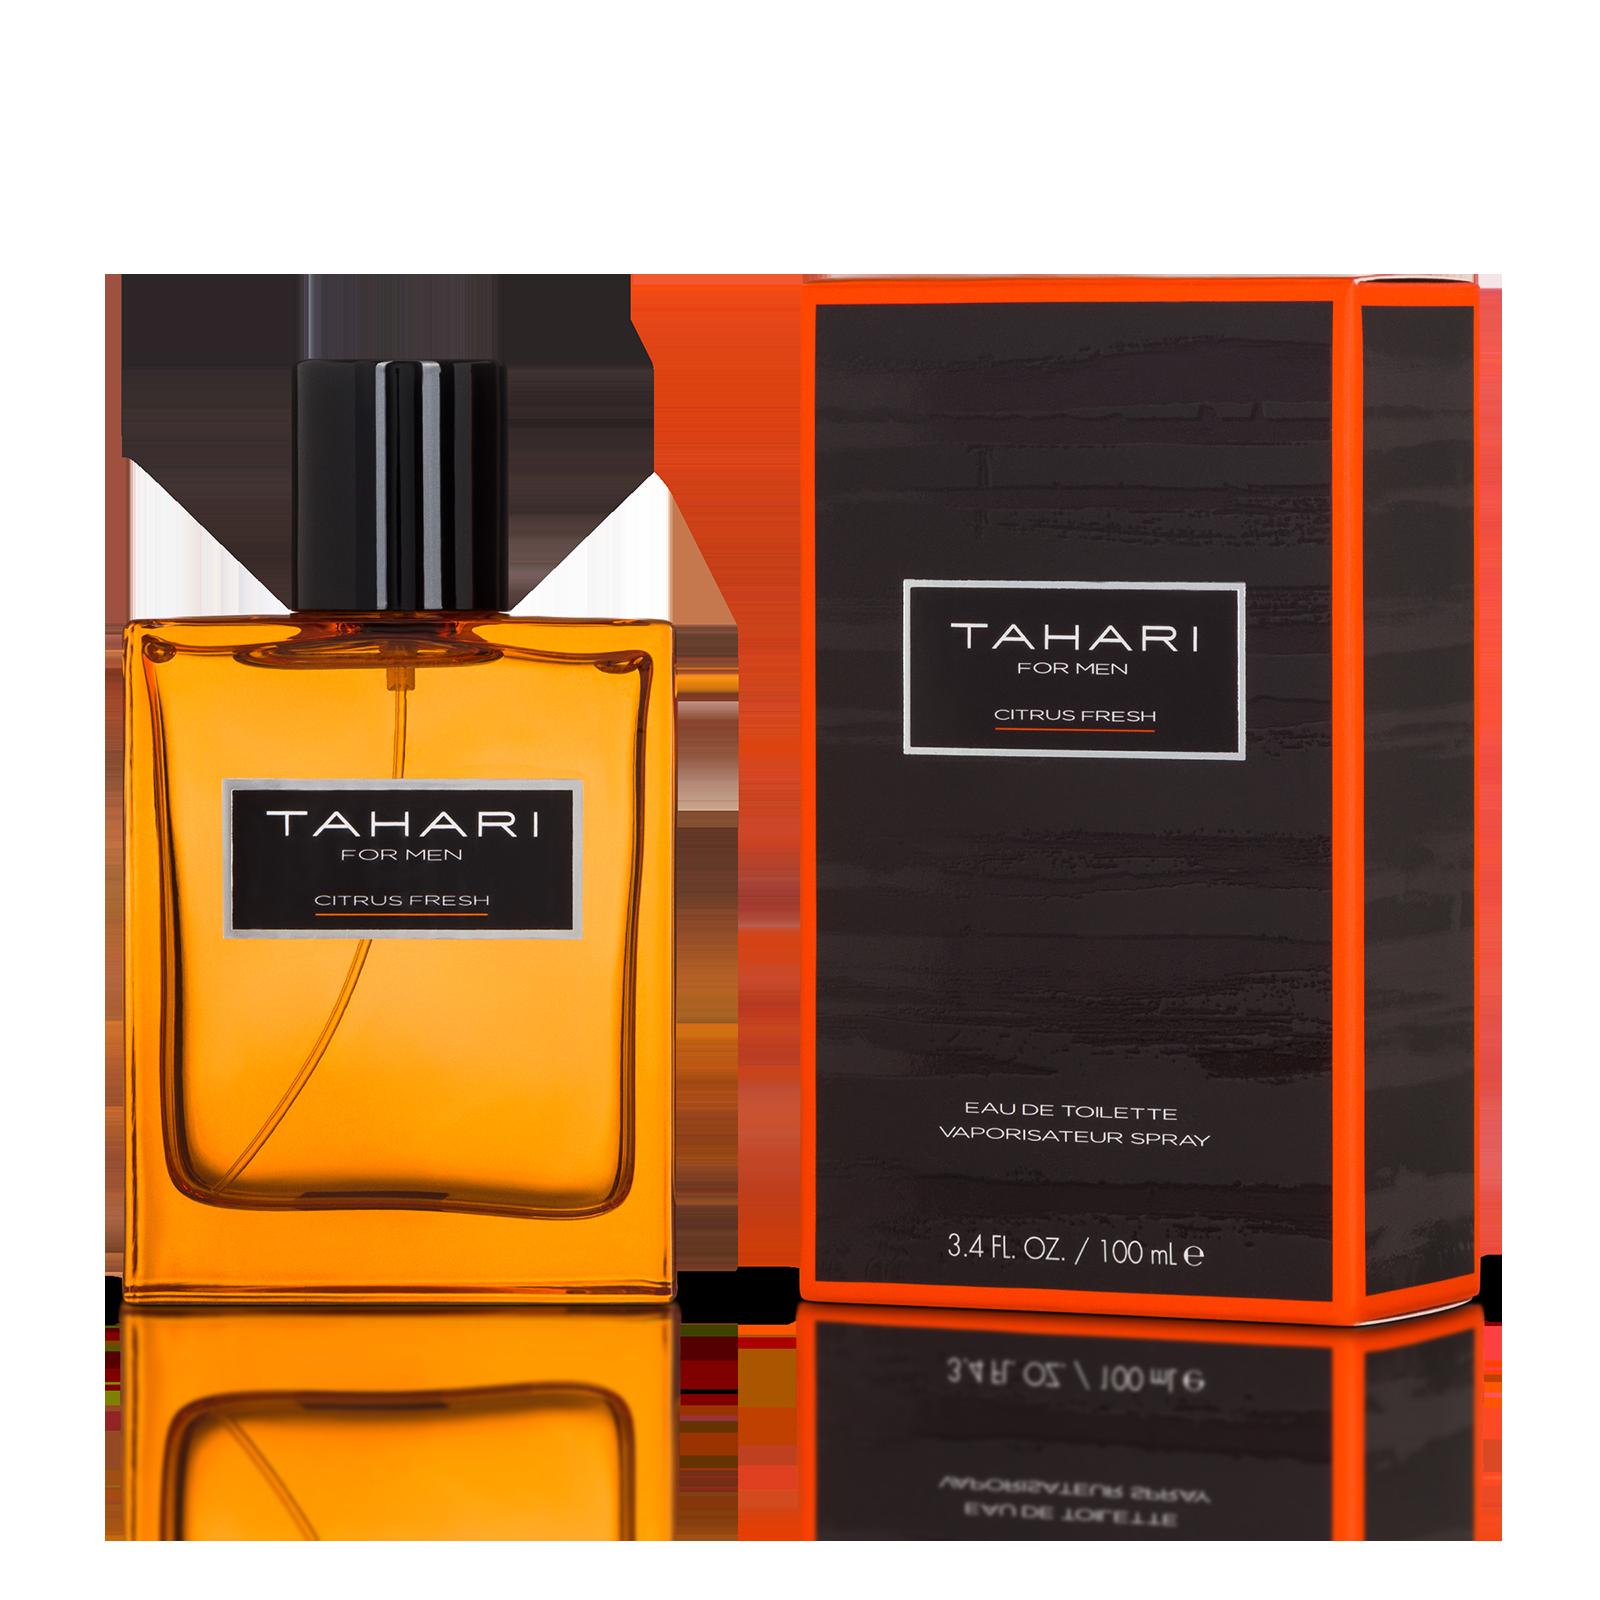 Perfume product image